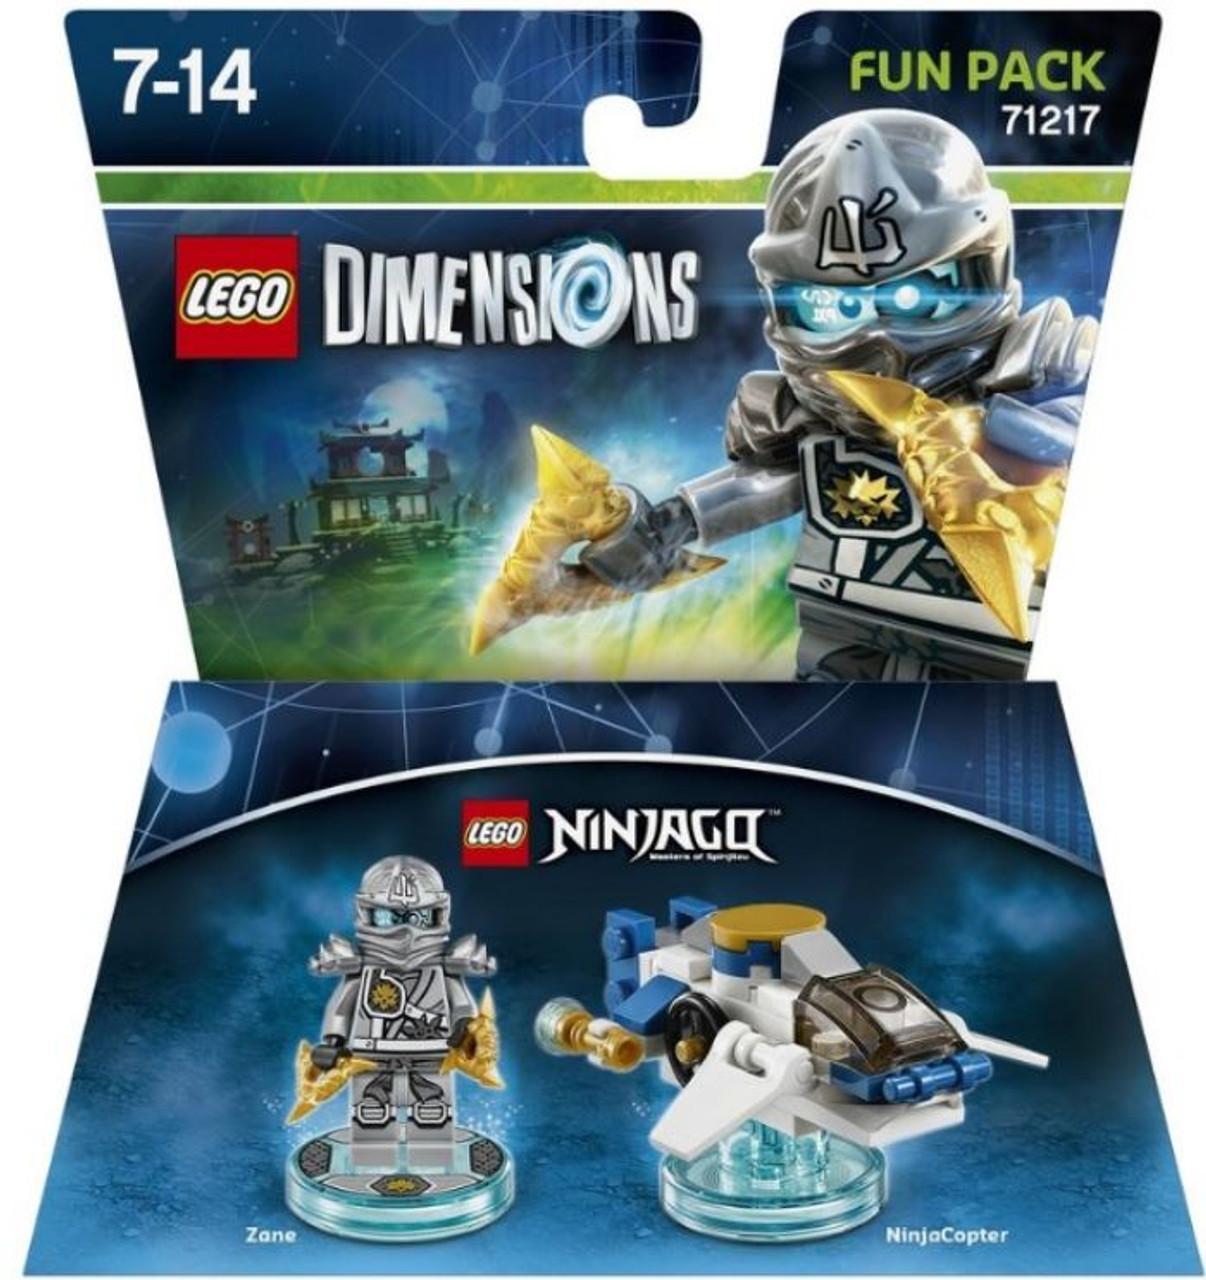 LEGO Dimensions Ninjago Zane NinjaCopter Fun Pack 71217 - ToyWiz